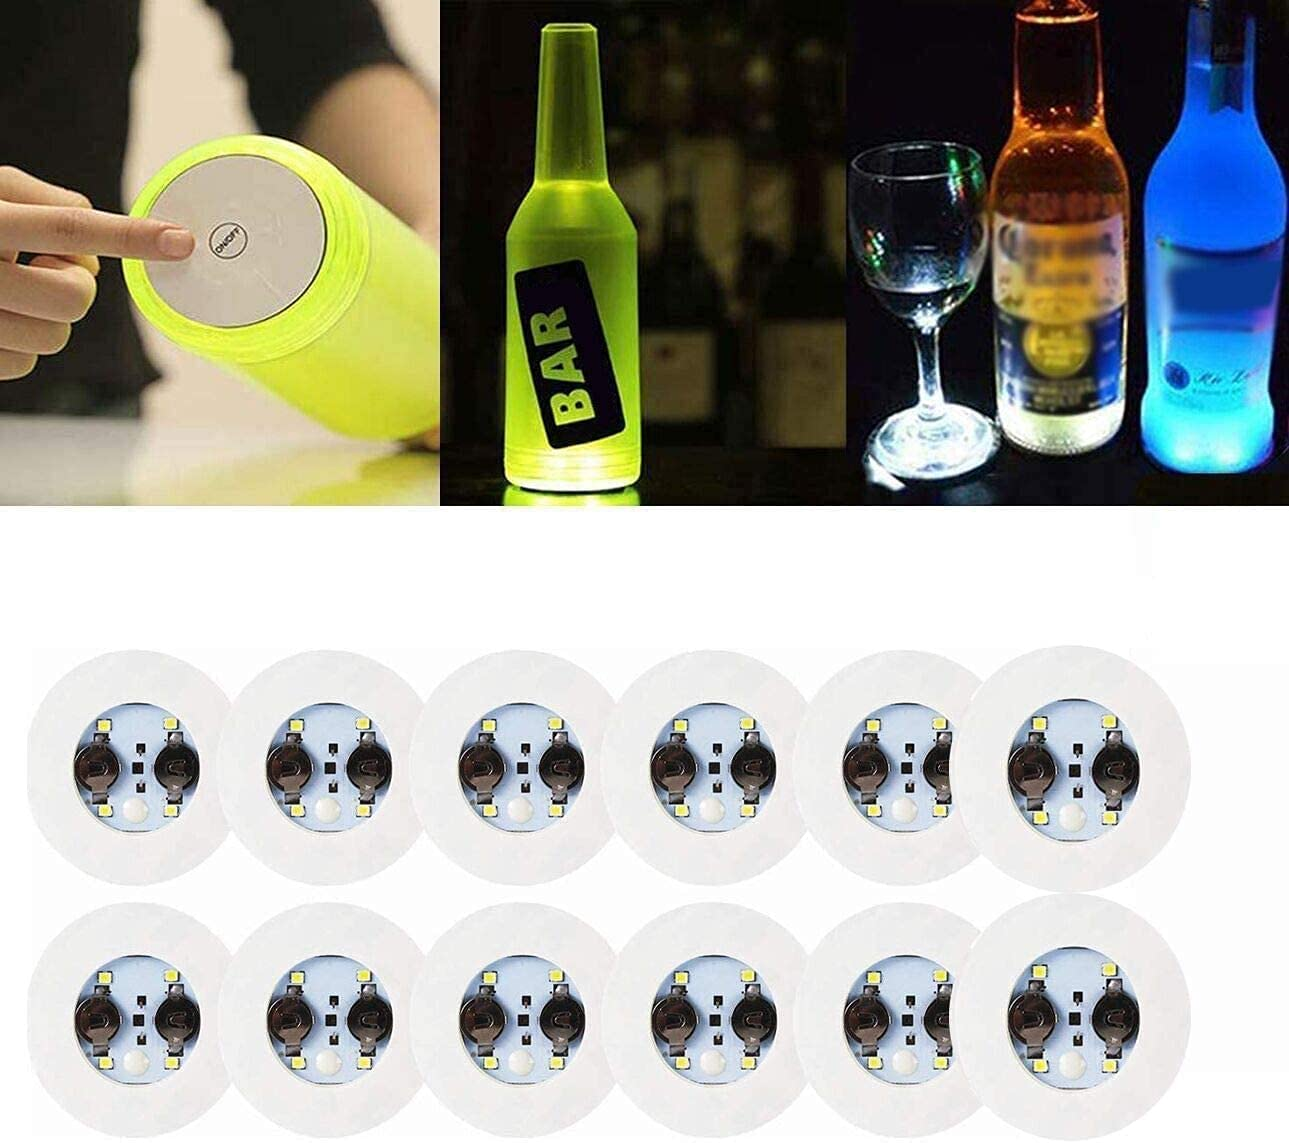 LOGUIDE LED Coaster,12 Pack Light Up Coasters,LED Bottle Lights,RGB Bottle Glorifier,LED Sticker Coaster Discs Light Up for Drinks,Flash Light Up Cup Coaster Flashing Shots Light (Cool-White)